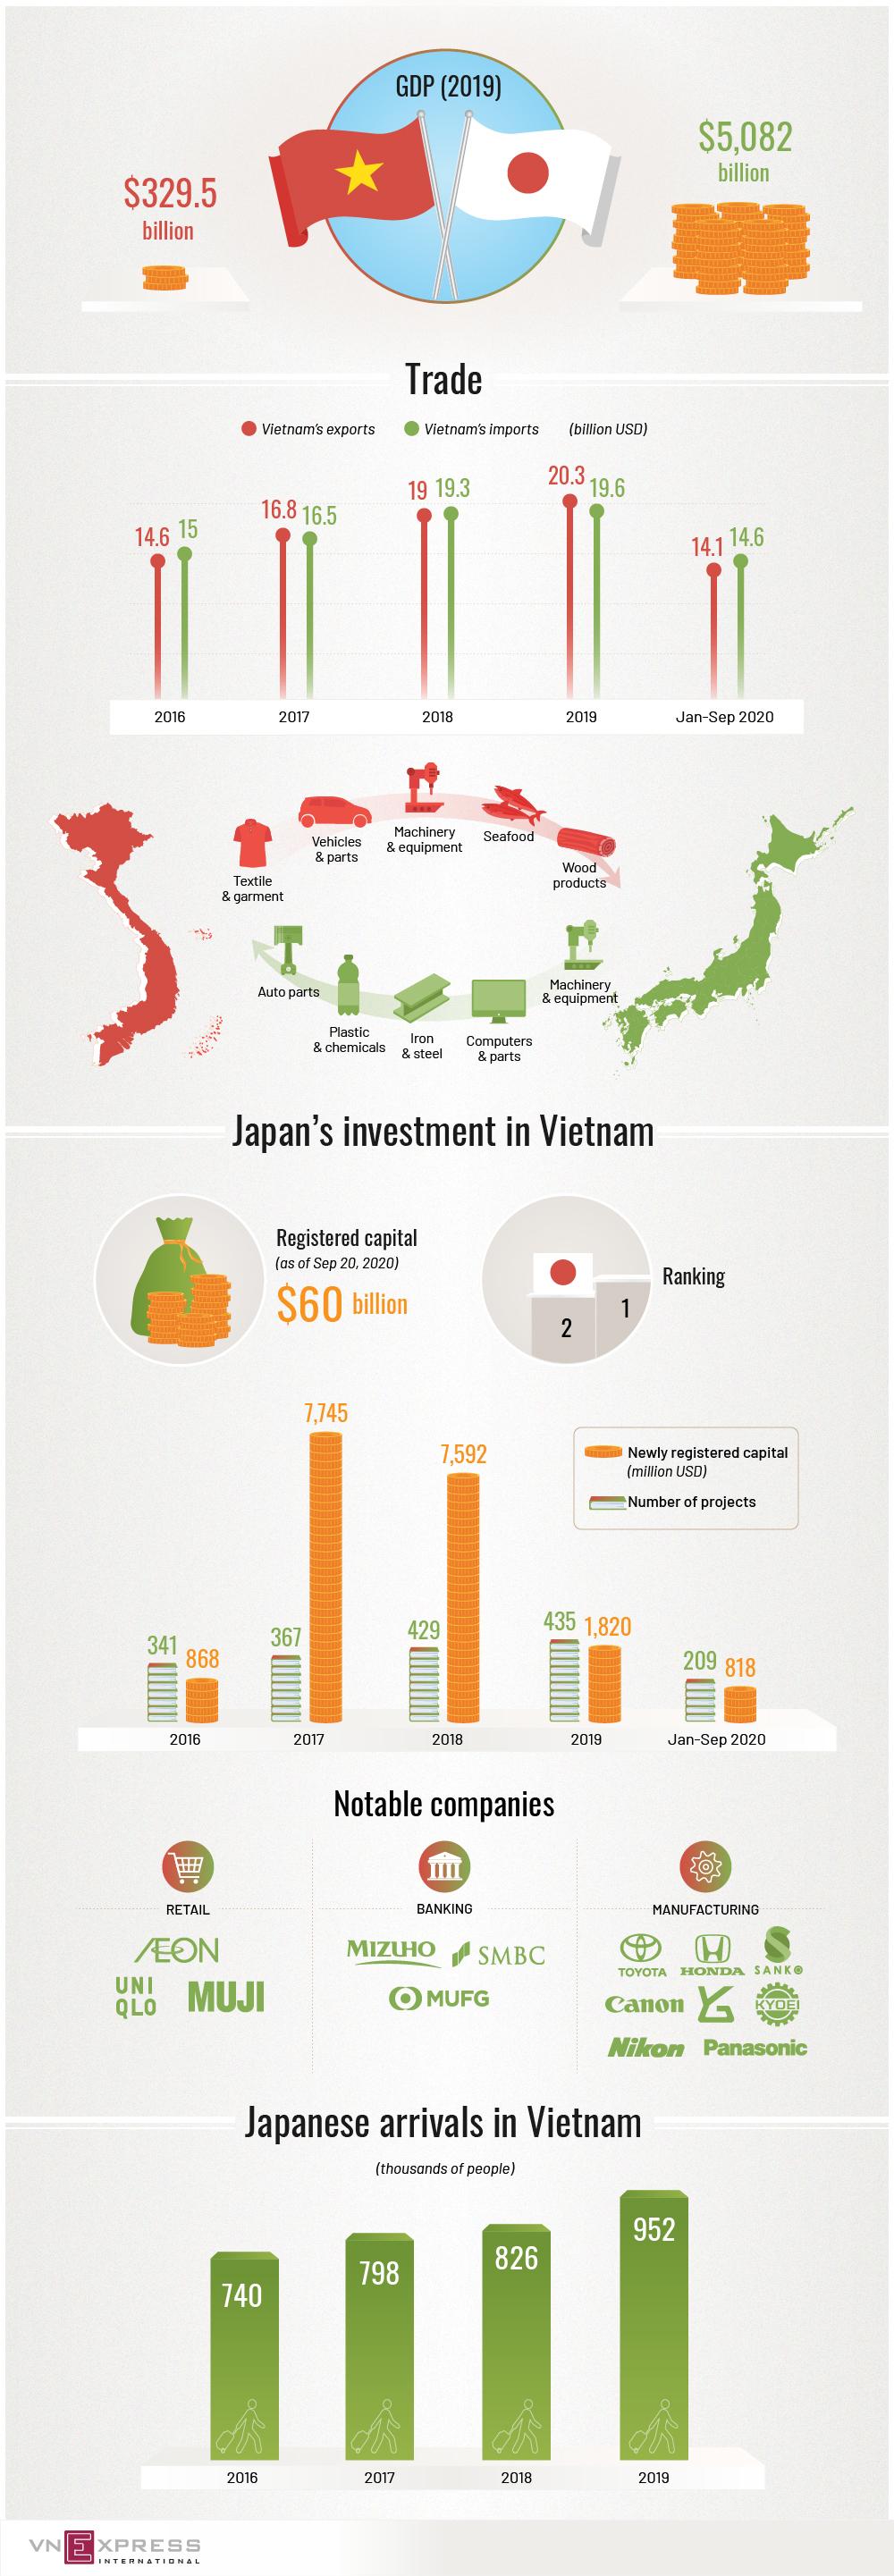 Japan, Vietnam boast thriving economic partnership